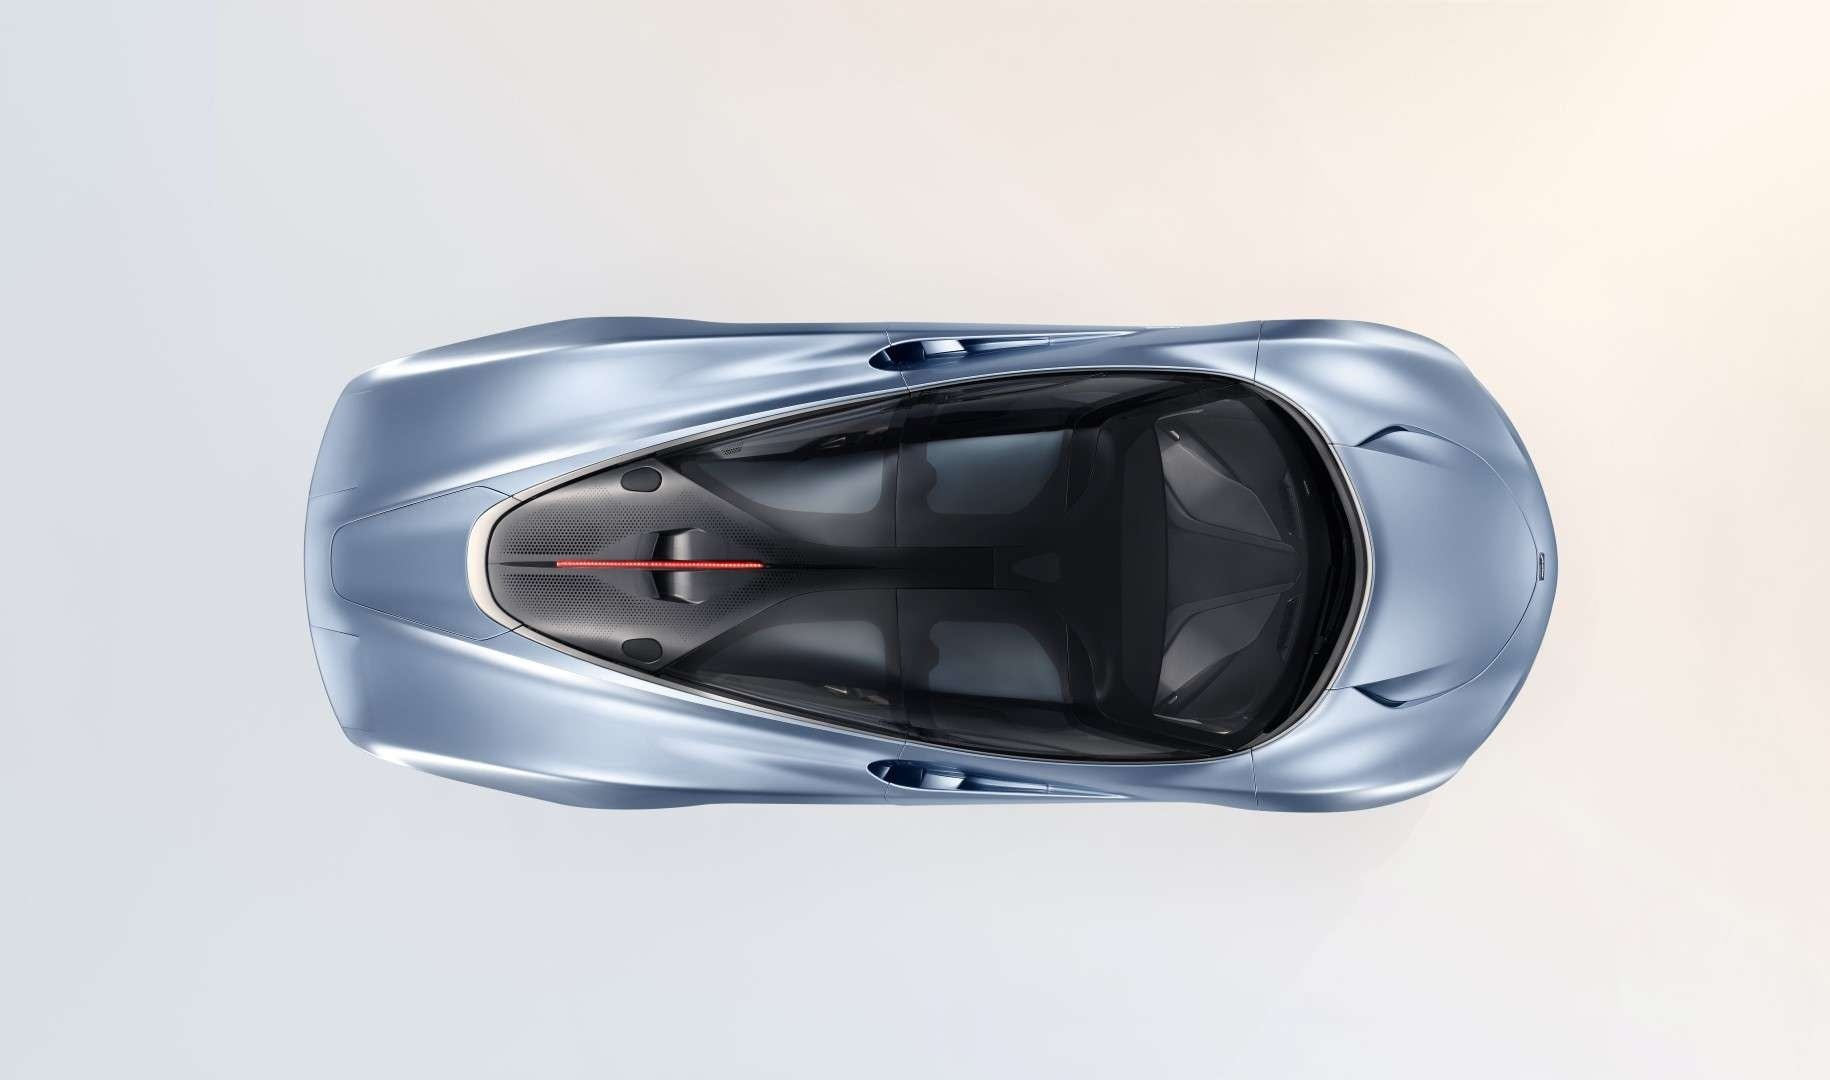 2019 - [McLaren] Speedtail (BP23) - Page 2 Ynv18q6enllsotj0xoud